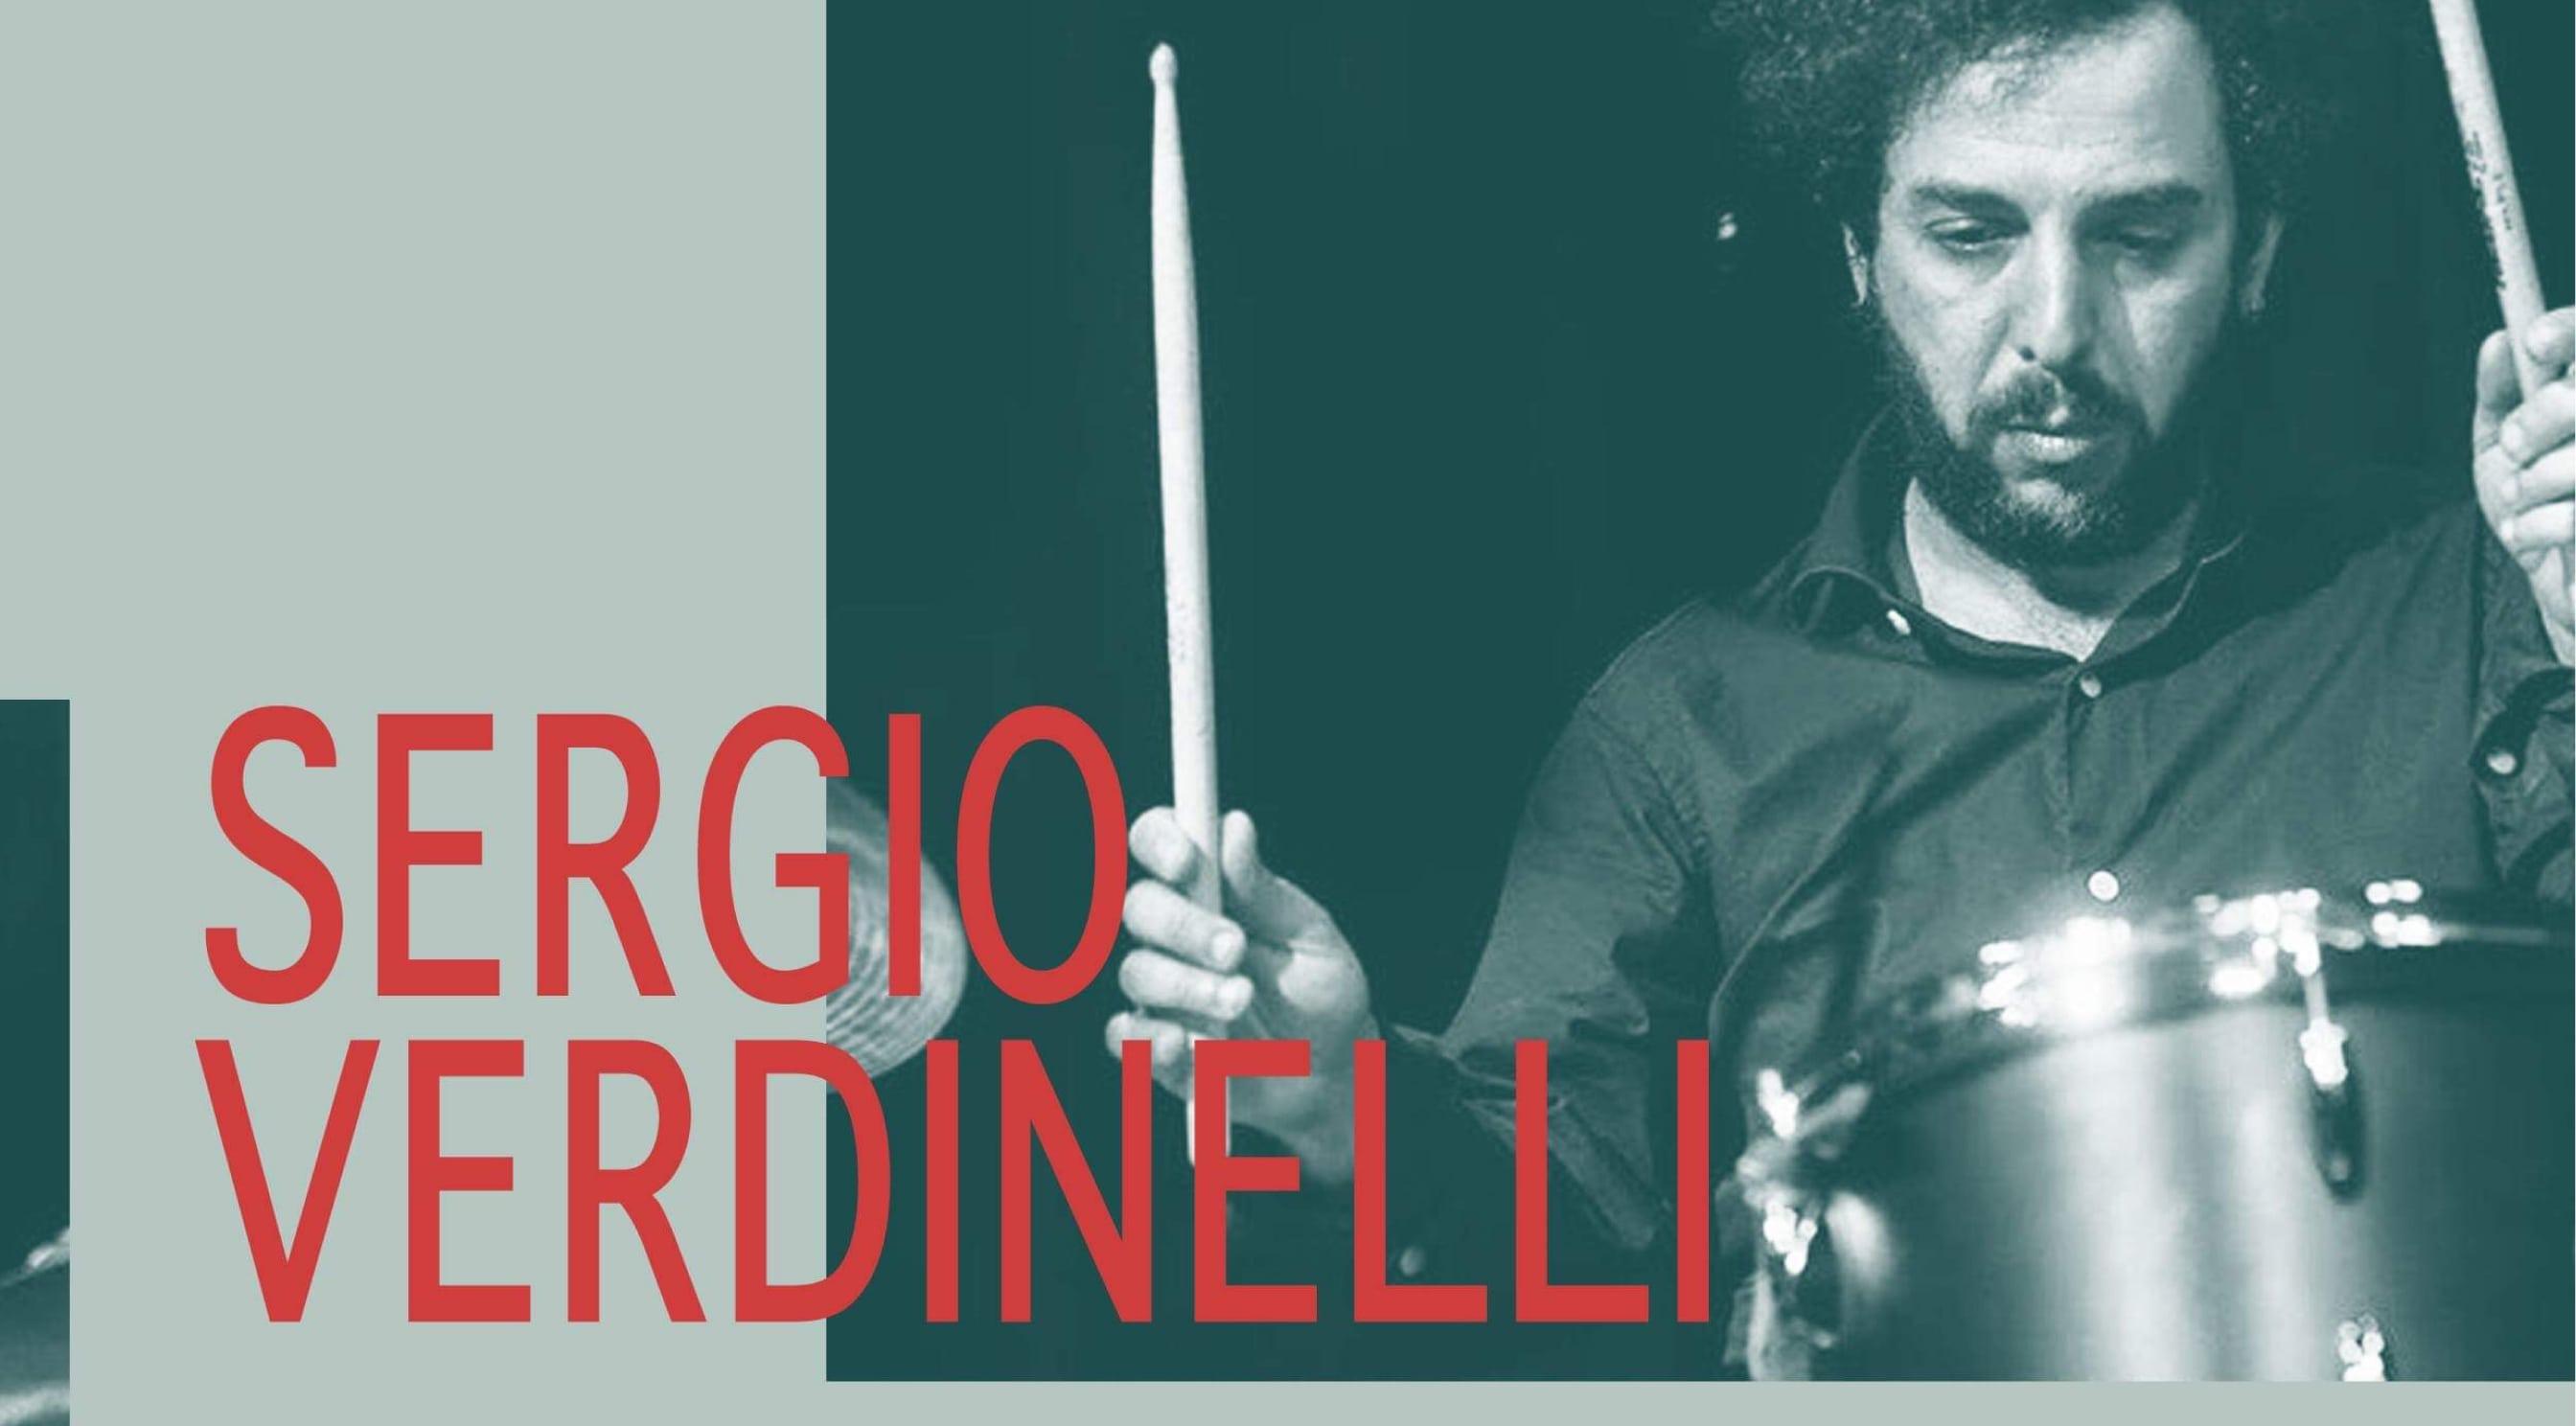 Sergio Verdinelli japan tour2019 with EXPE In navaro